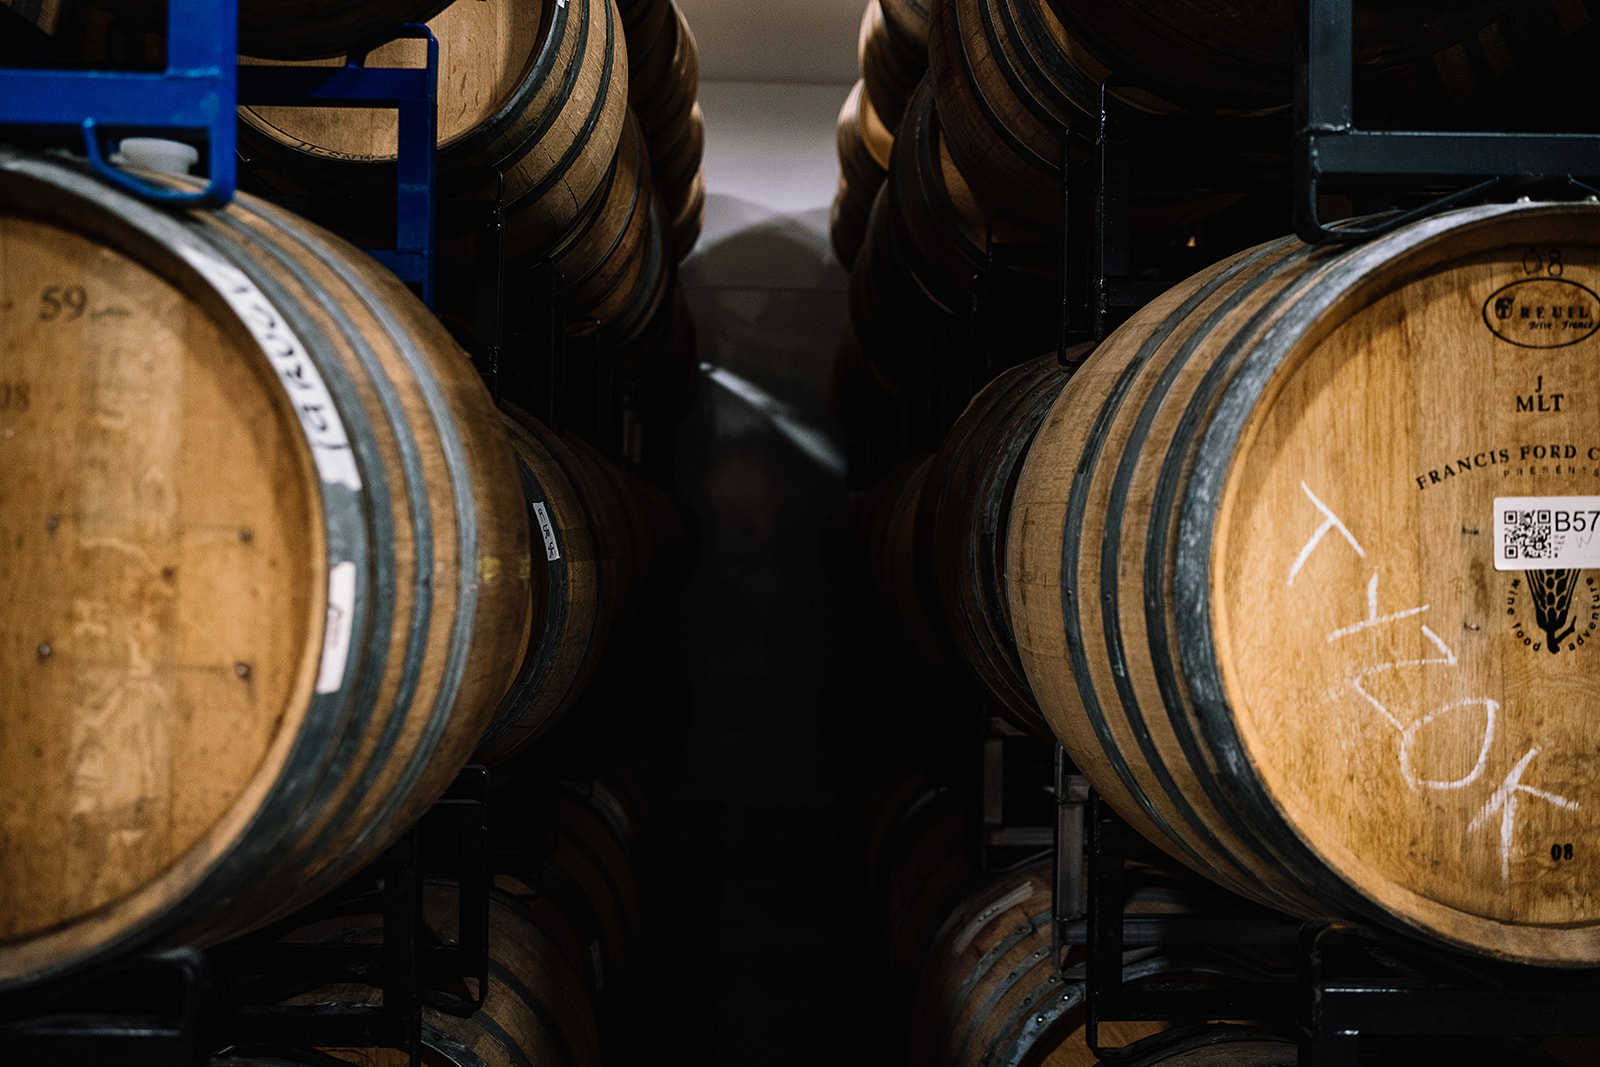 Carboy Winery wooden wine kegs.